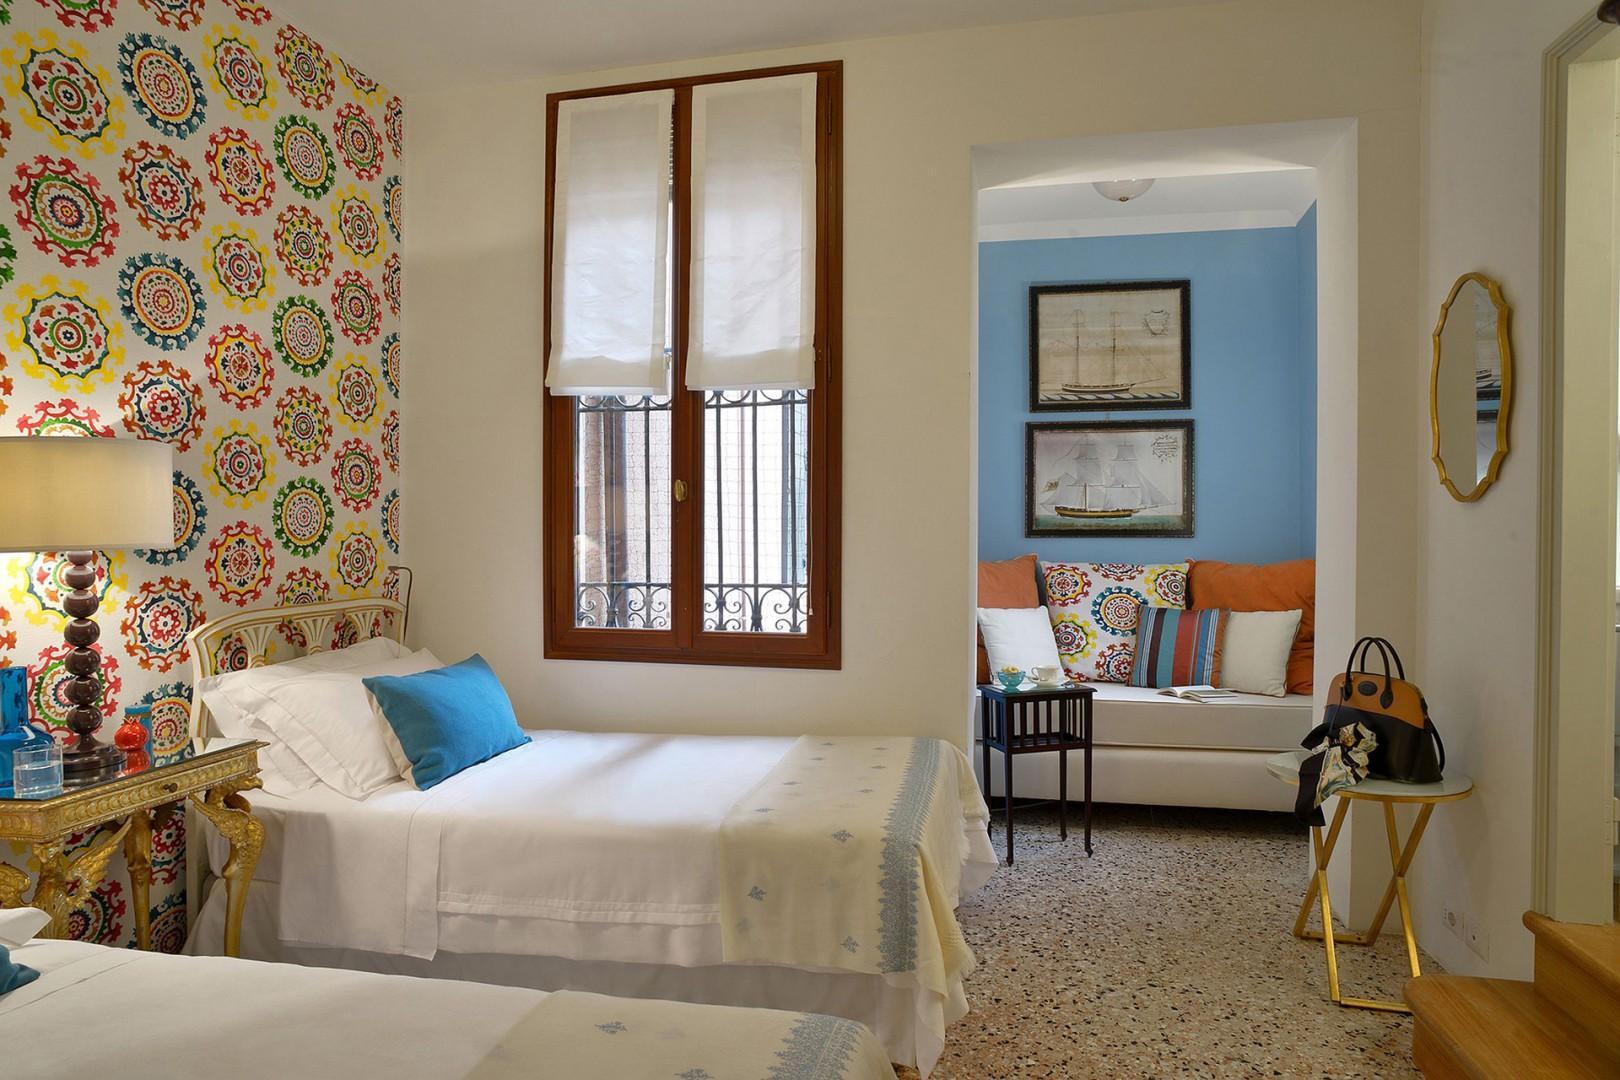 Two beds in happy bedroom 2.